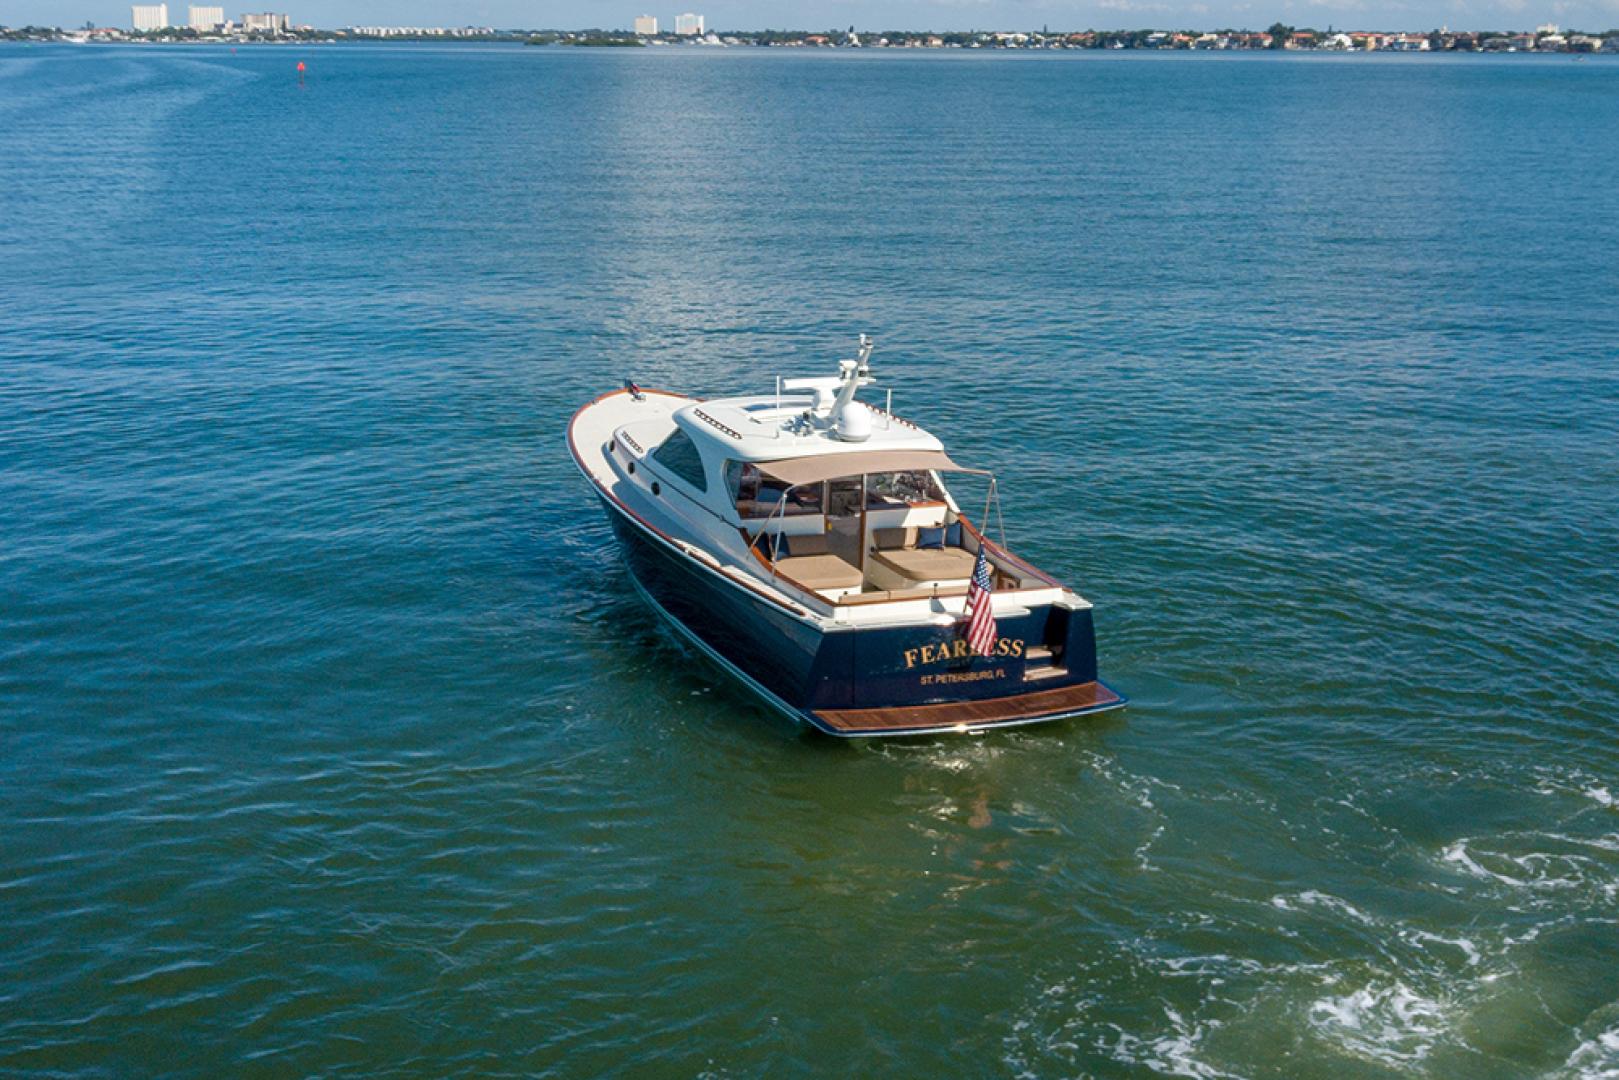 San Juan-SJ48 Express 2006 FEARLESS Saint Petersburg-Florida-United States-Port quarter profile-1508124 | Thumbnail